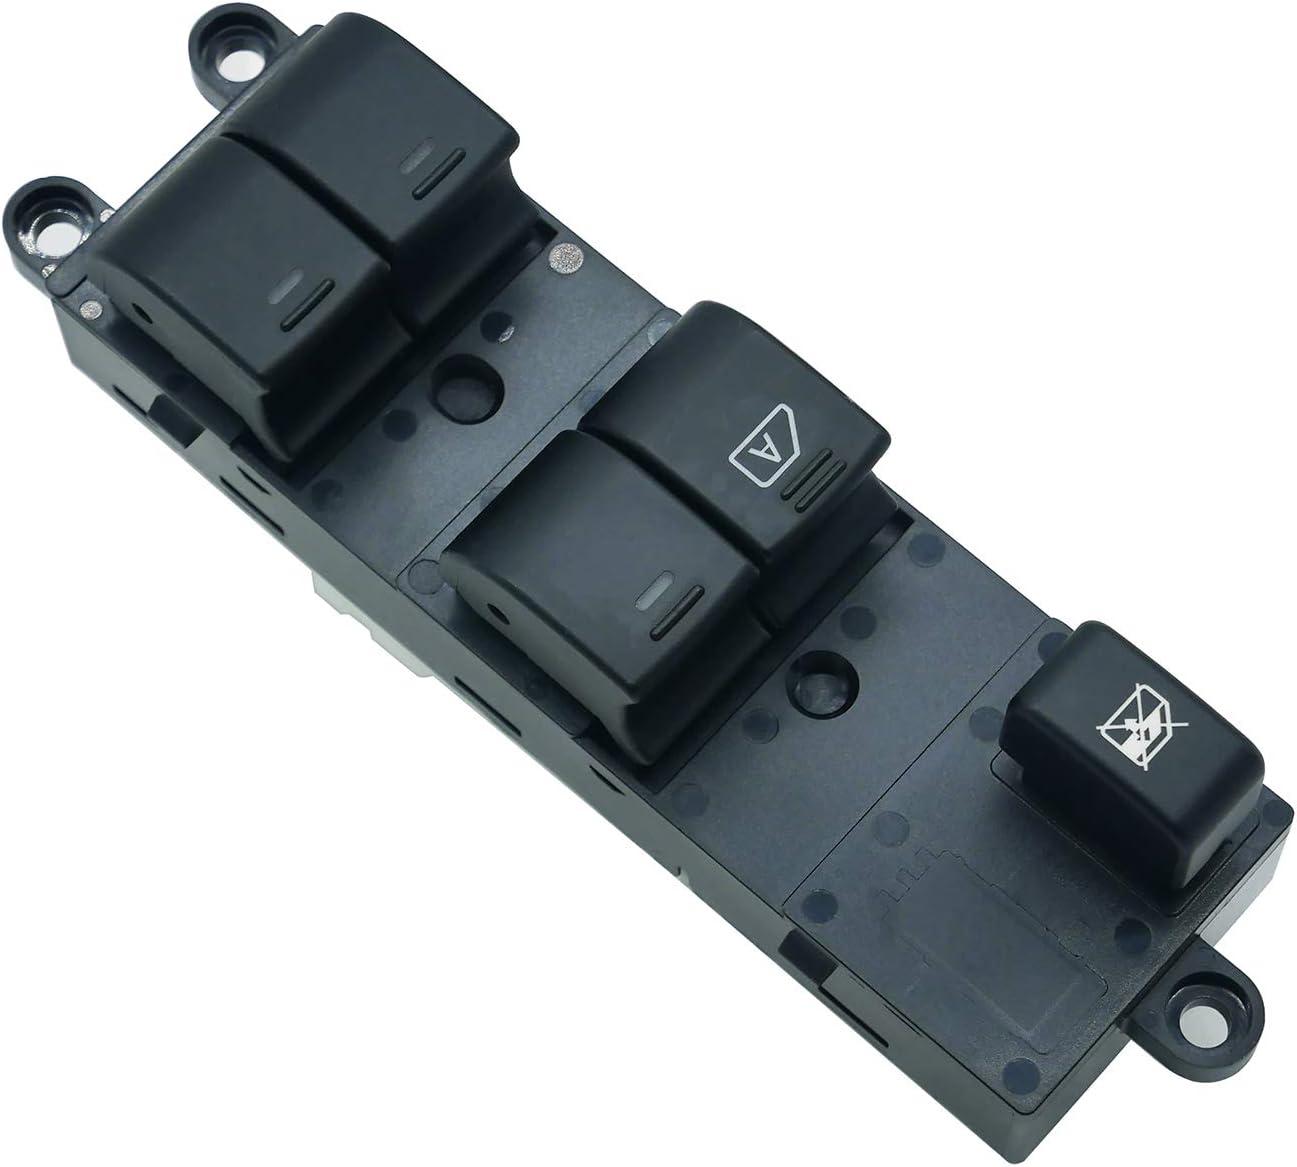 ZEALfix Interruttore Alzacristalli Elettrico, Pulsantiera Finestra 25401-EB30B per Qashqai Navara Pathfinder